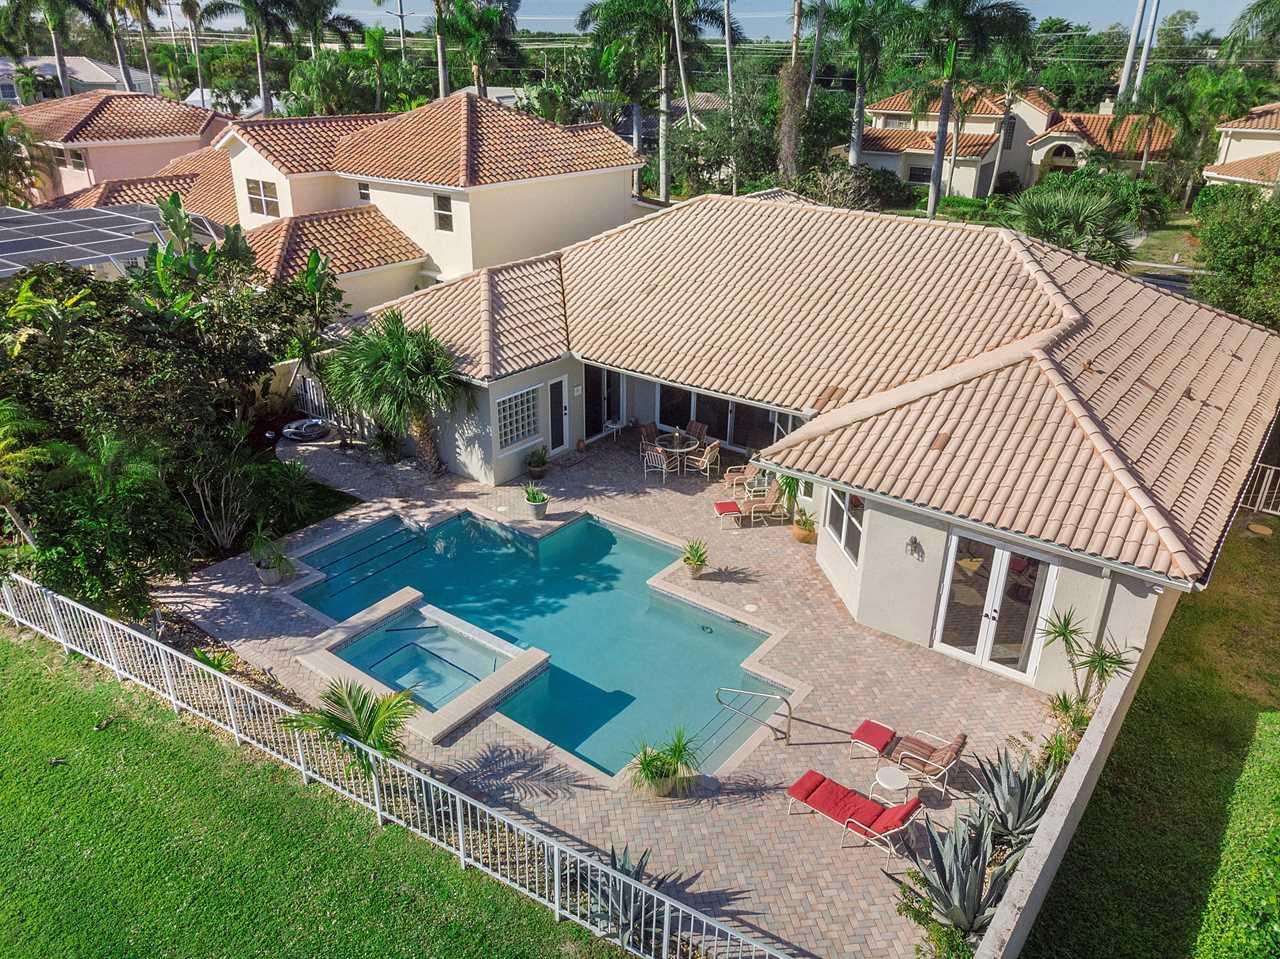 10960 Haydn Drive Boca Raton, FL 33498 - MLS# RX-10494531 | BocaRatonRealEstate.com Photo 1